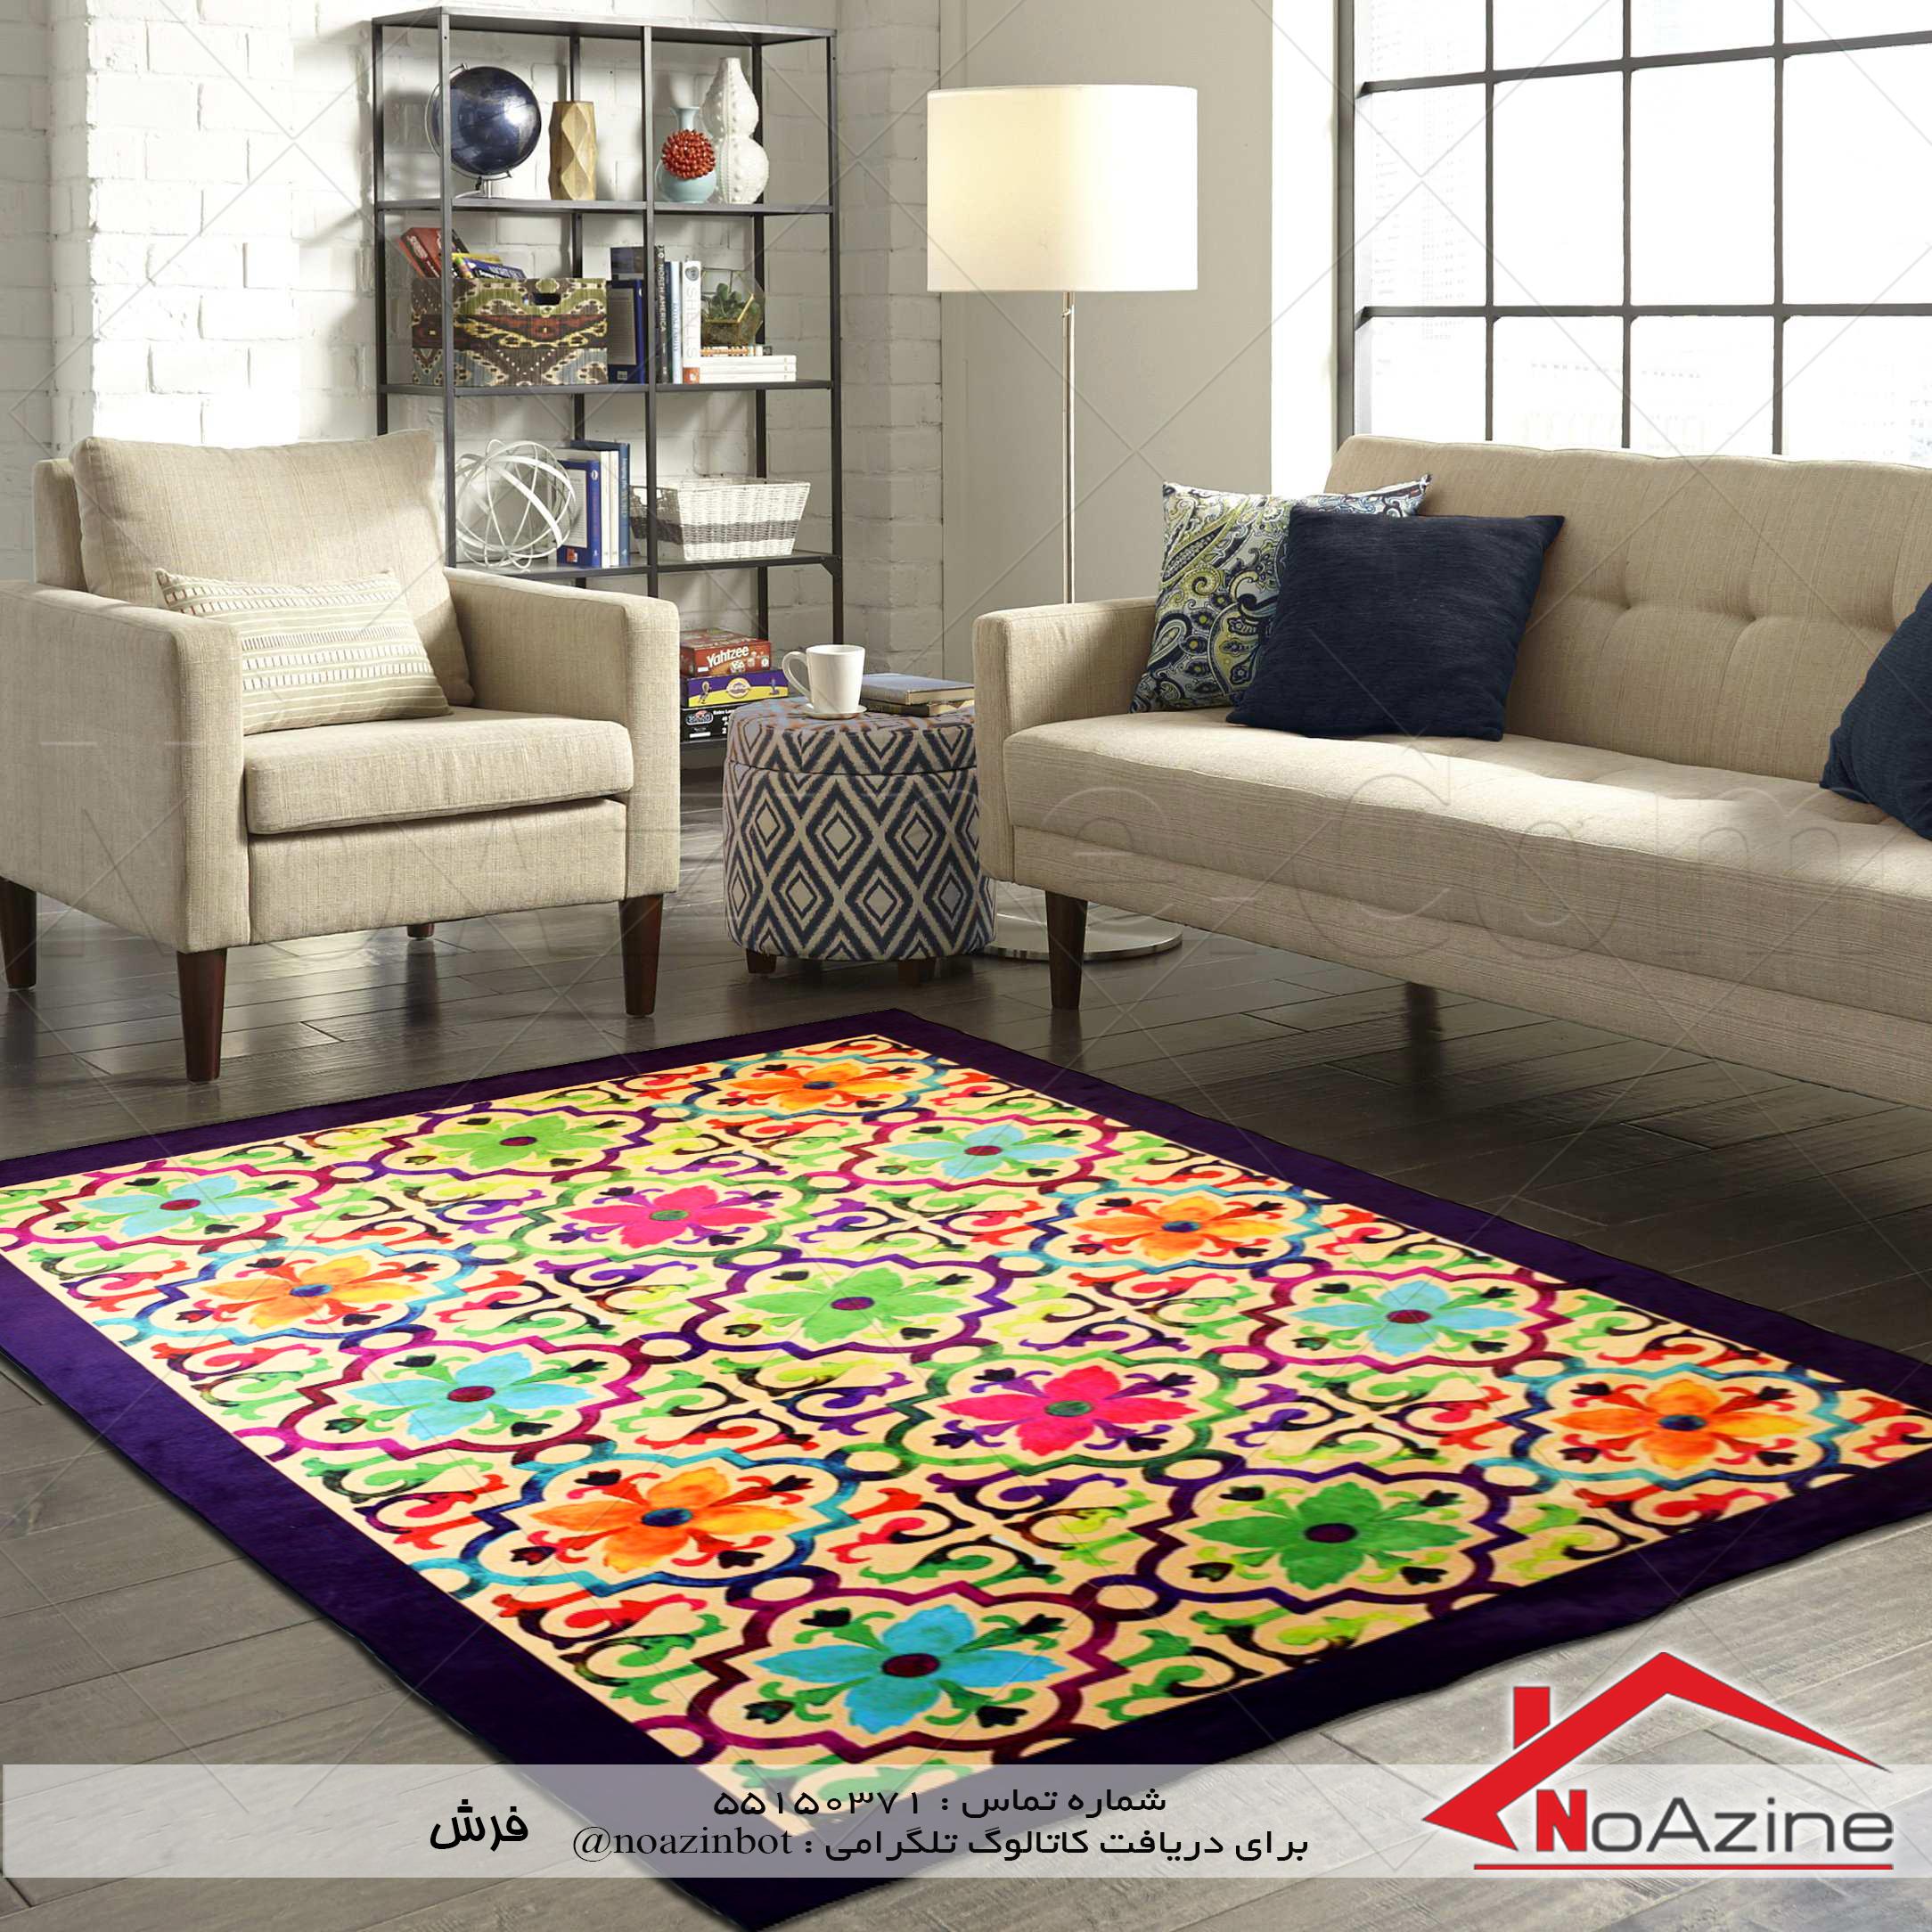 Luxurious living room carpet walmart For Living Room Carpet Walmart